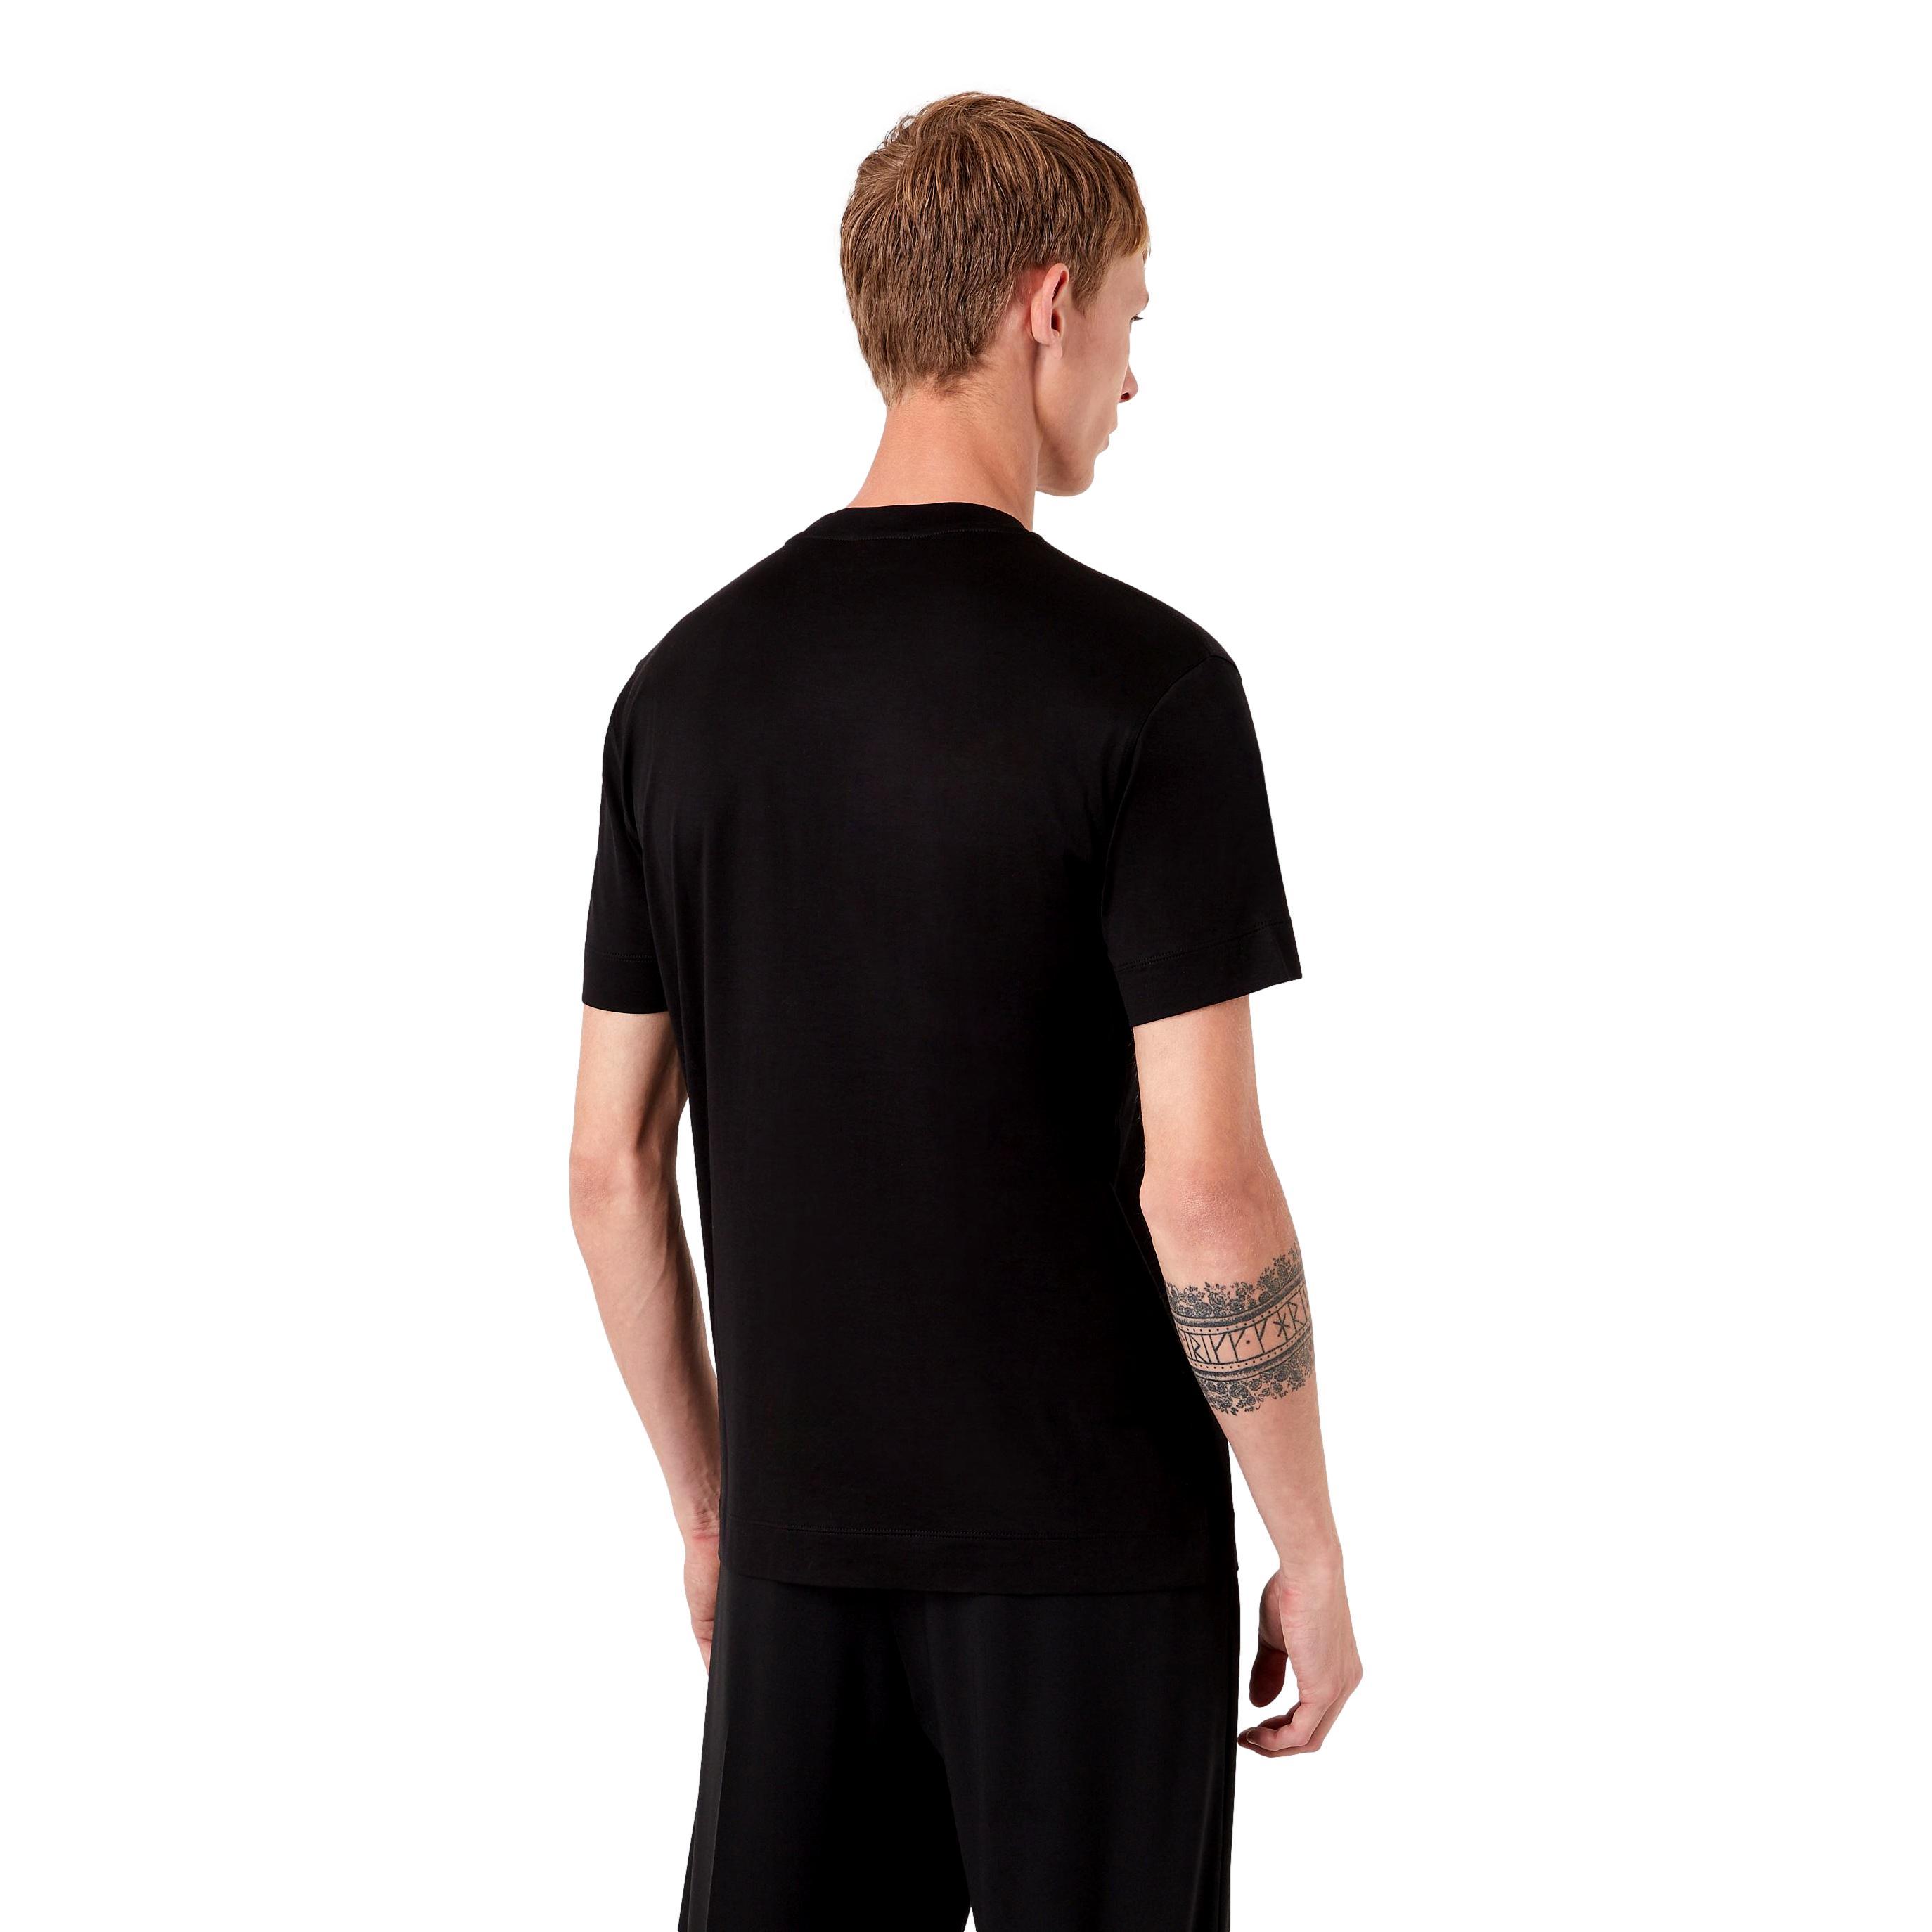 T-shirt in jersey misto Tencel stampa riquadro logo EMPORIO ARMANI   T-shirt   6K1T94 1JUVZ0999